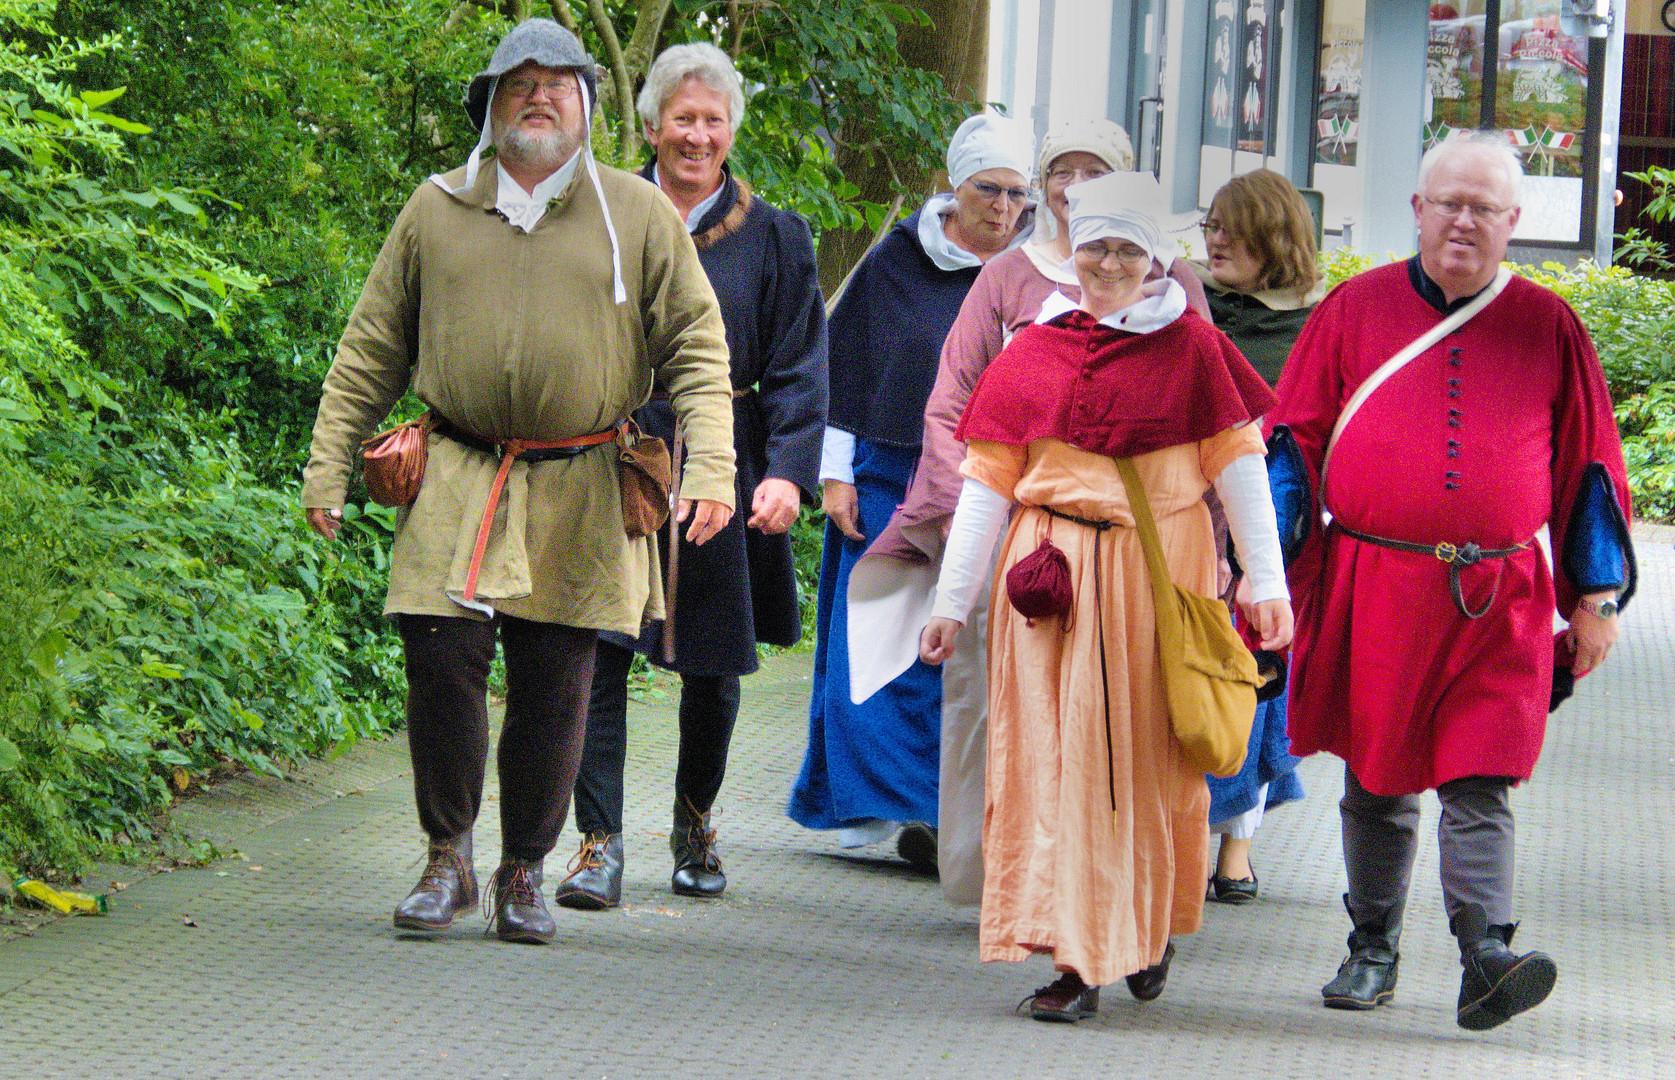 Stadtfest in Lippstadt